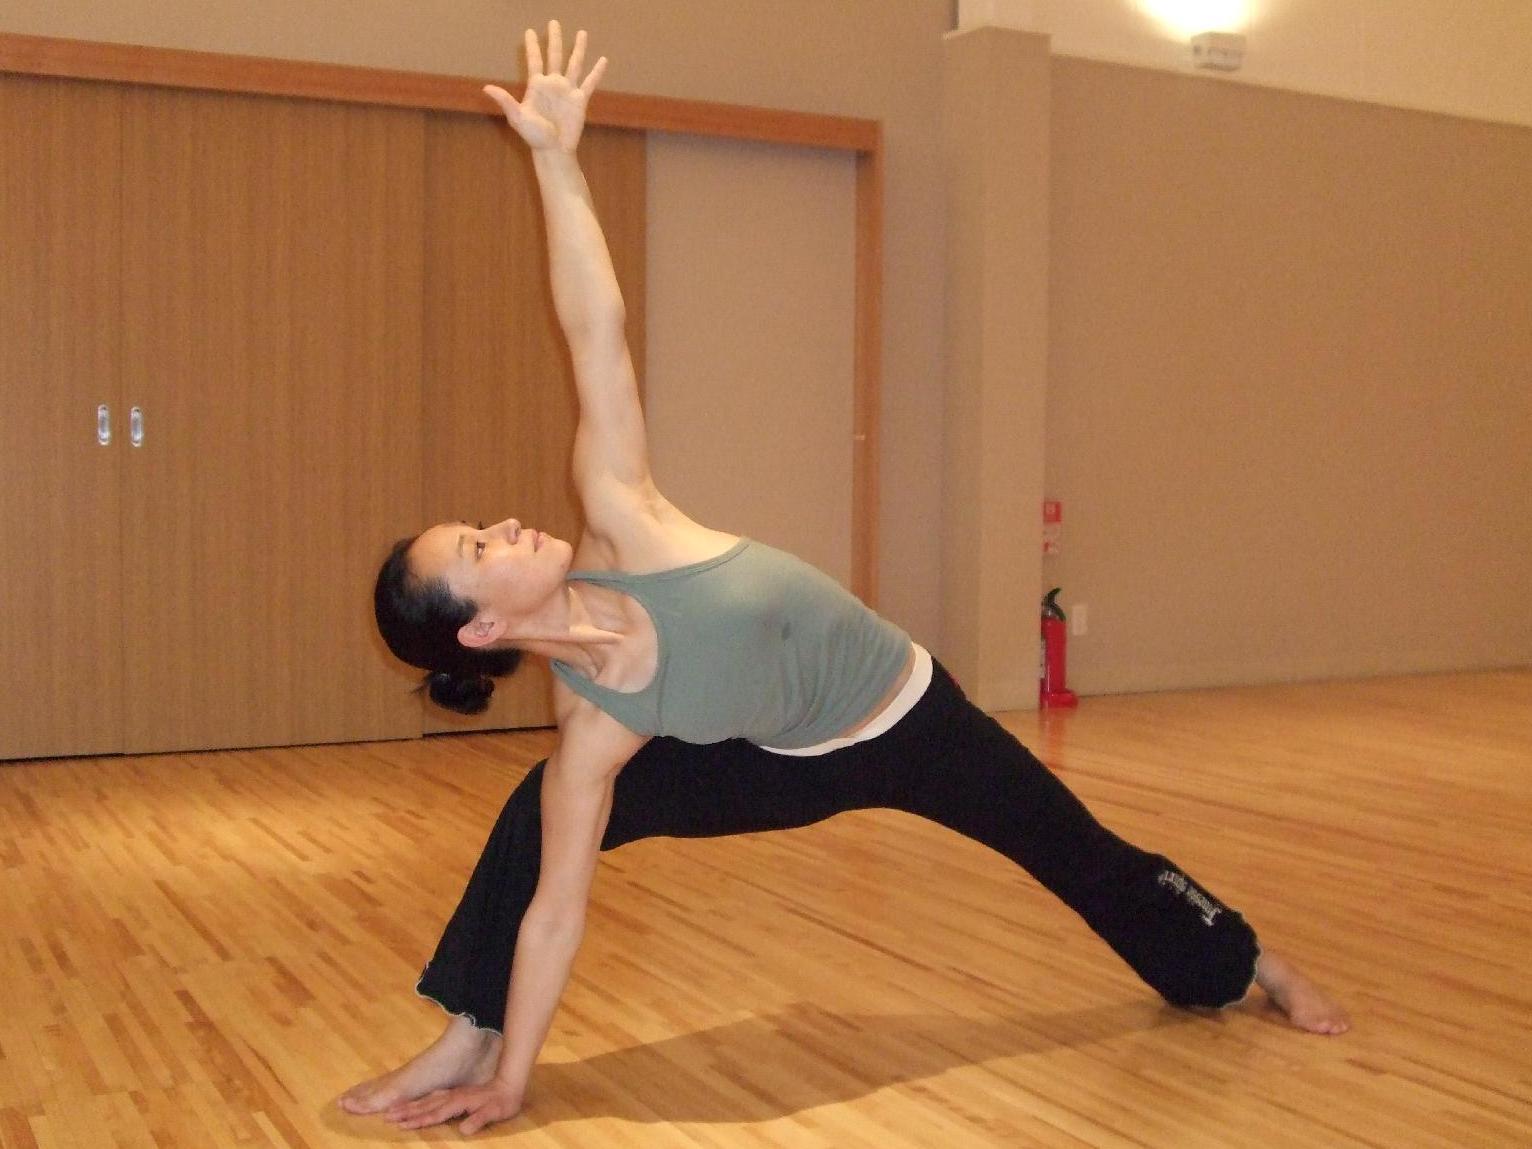 esty yoga(エスティヨガ) - 二見(フタミ)さんの写真